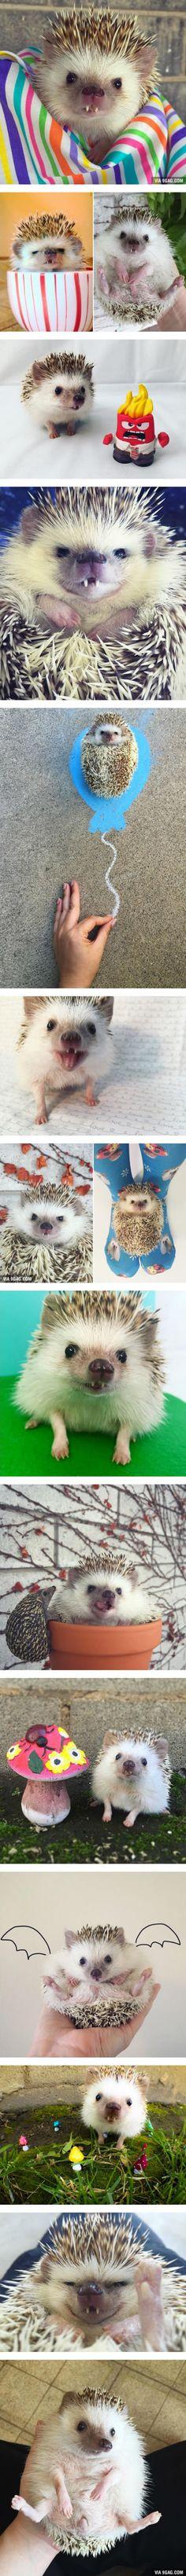 Meet Huff: The Vampire Hedgehog